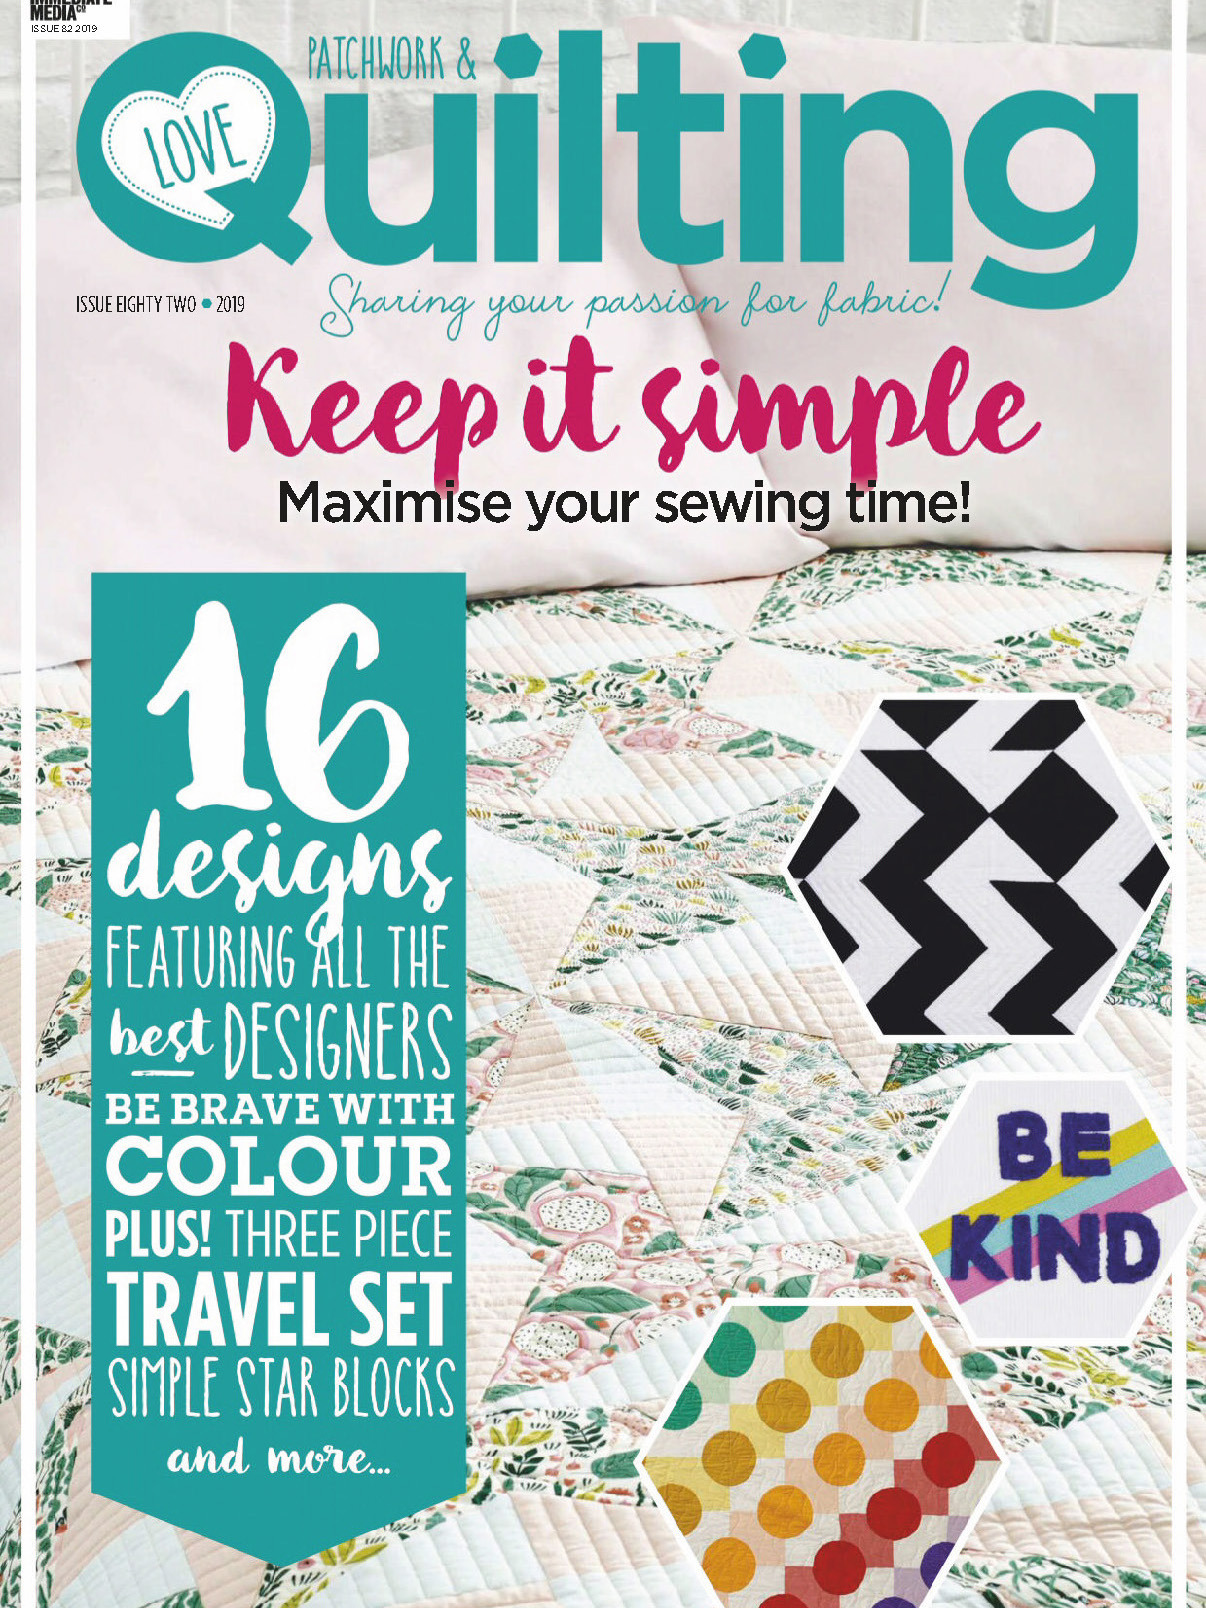 《Love Patchwork & Quilting》英国版时尚拼布杂志2020年01月号